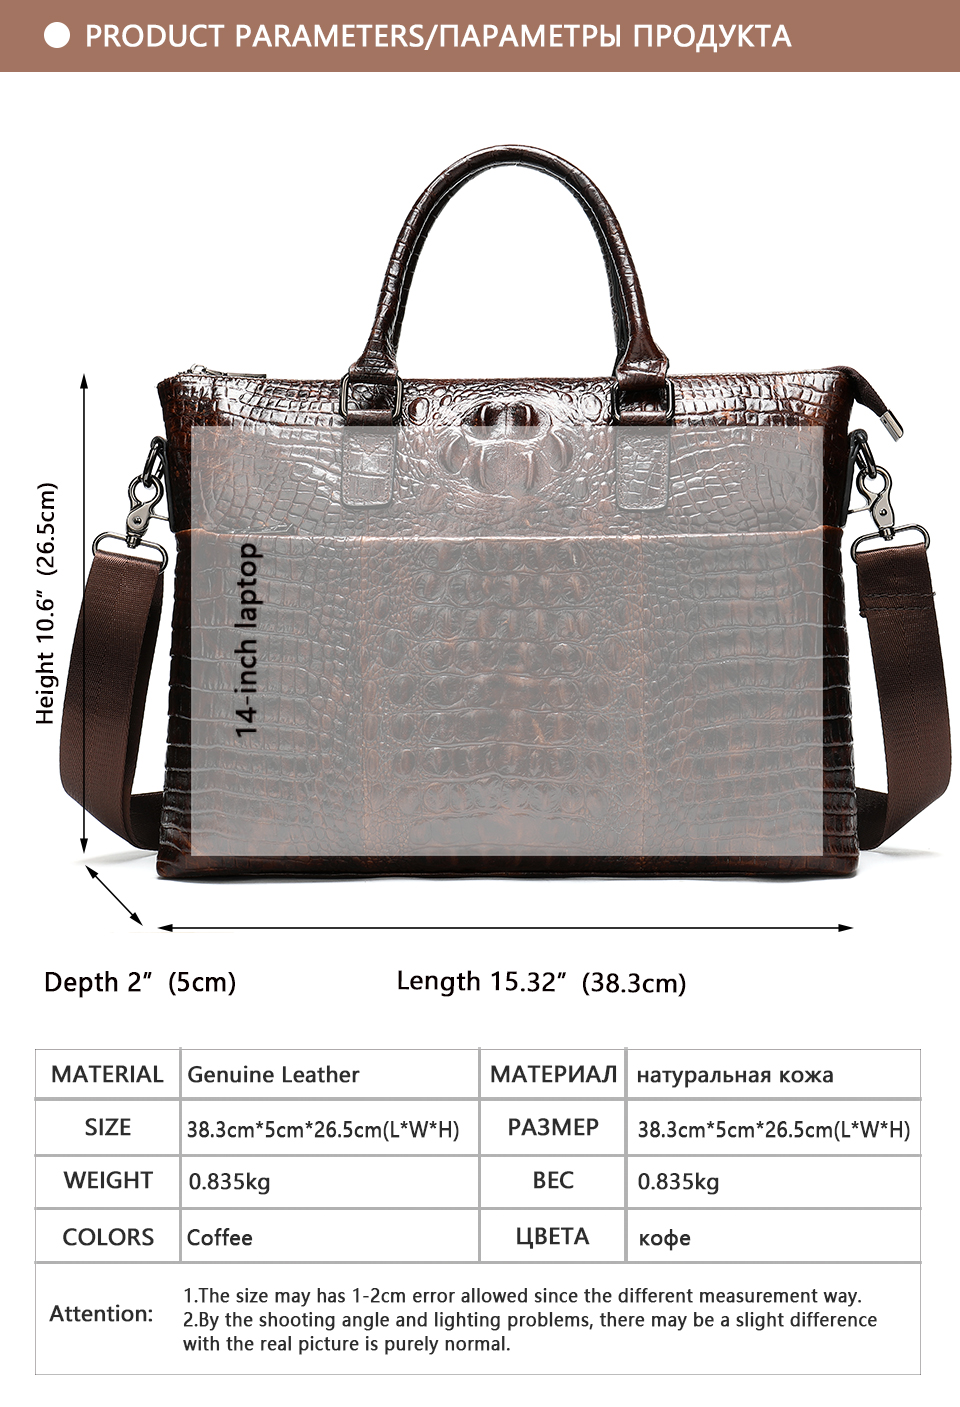 HTB1gJTVe8WD3KVjSZFsq6AqkpXaZ WESTAL Men Briefcase Men's Bag Genuine Leather Office Bags for Men Laptop Bag Leather Briefcase Men Croco Design Computer Bags